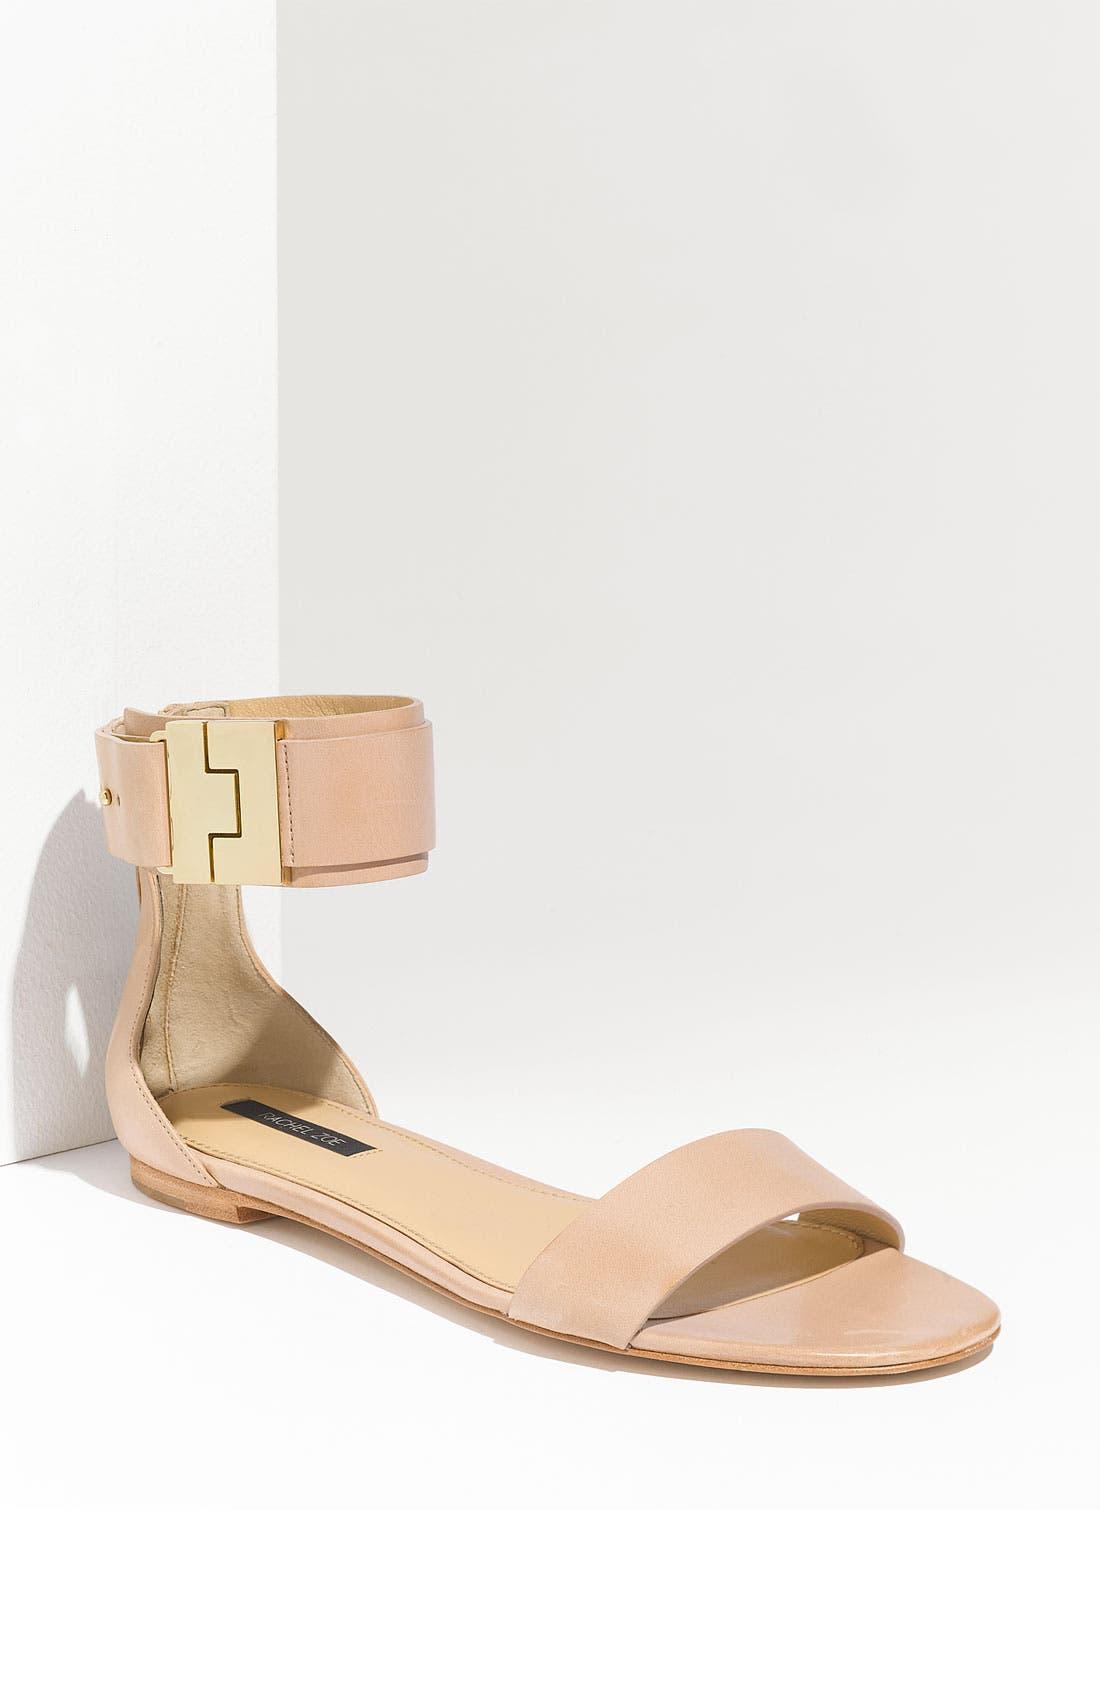 Alternate Image 1 Selected - Rachel Zoe 'Gladys' Flat Sandal